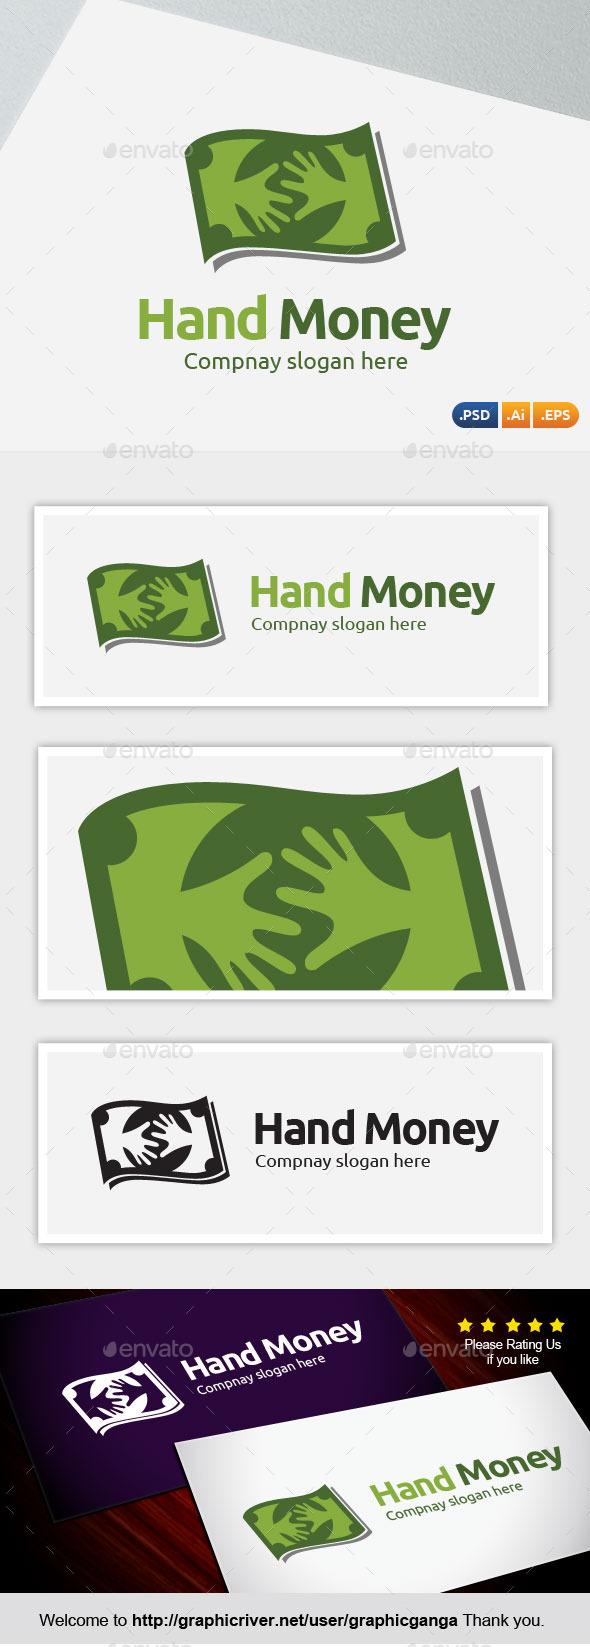 GraphicRiver Hand Money 9934947